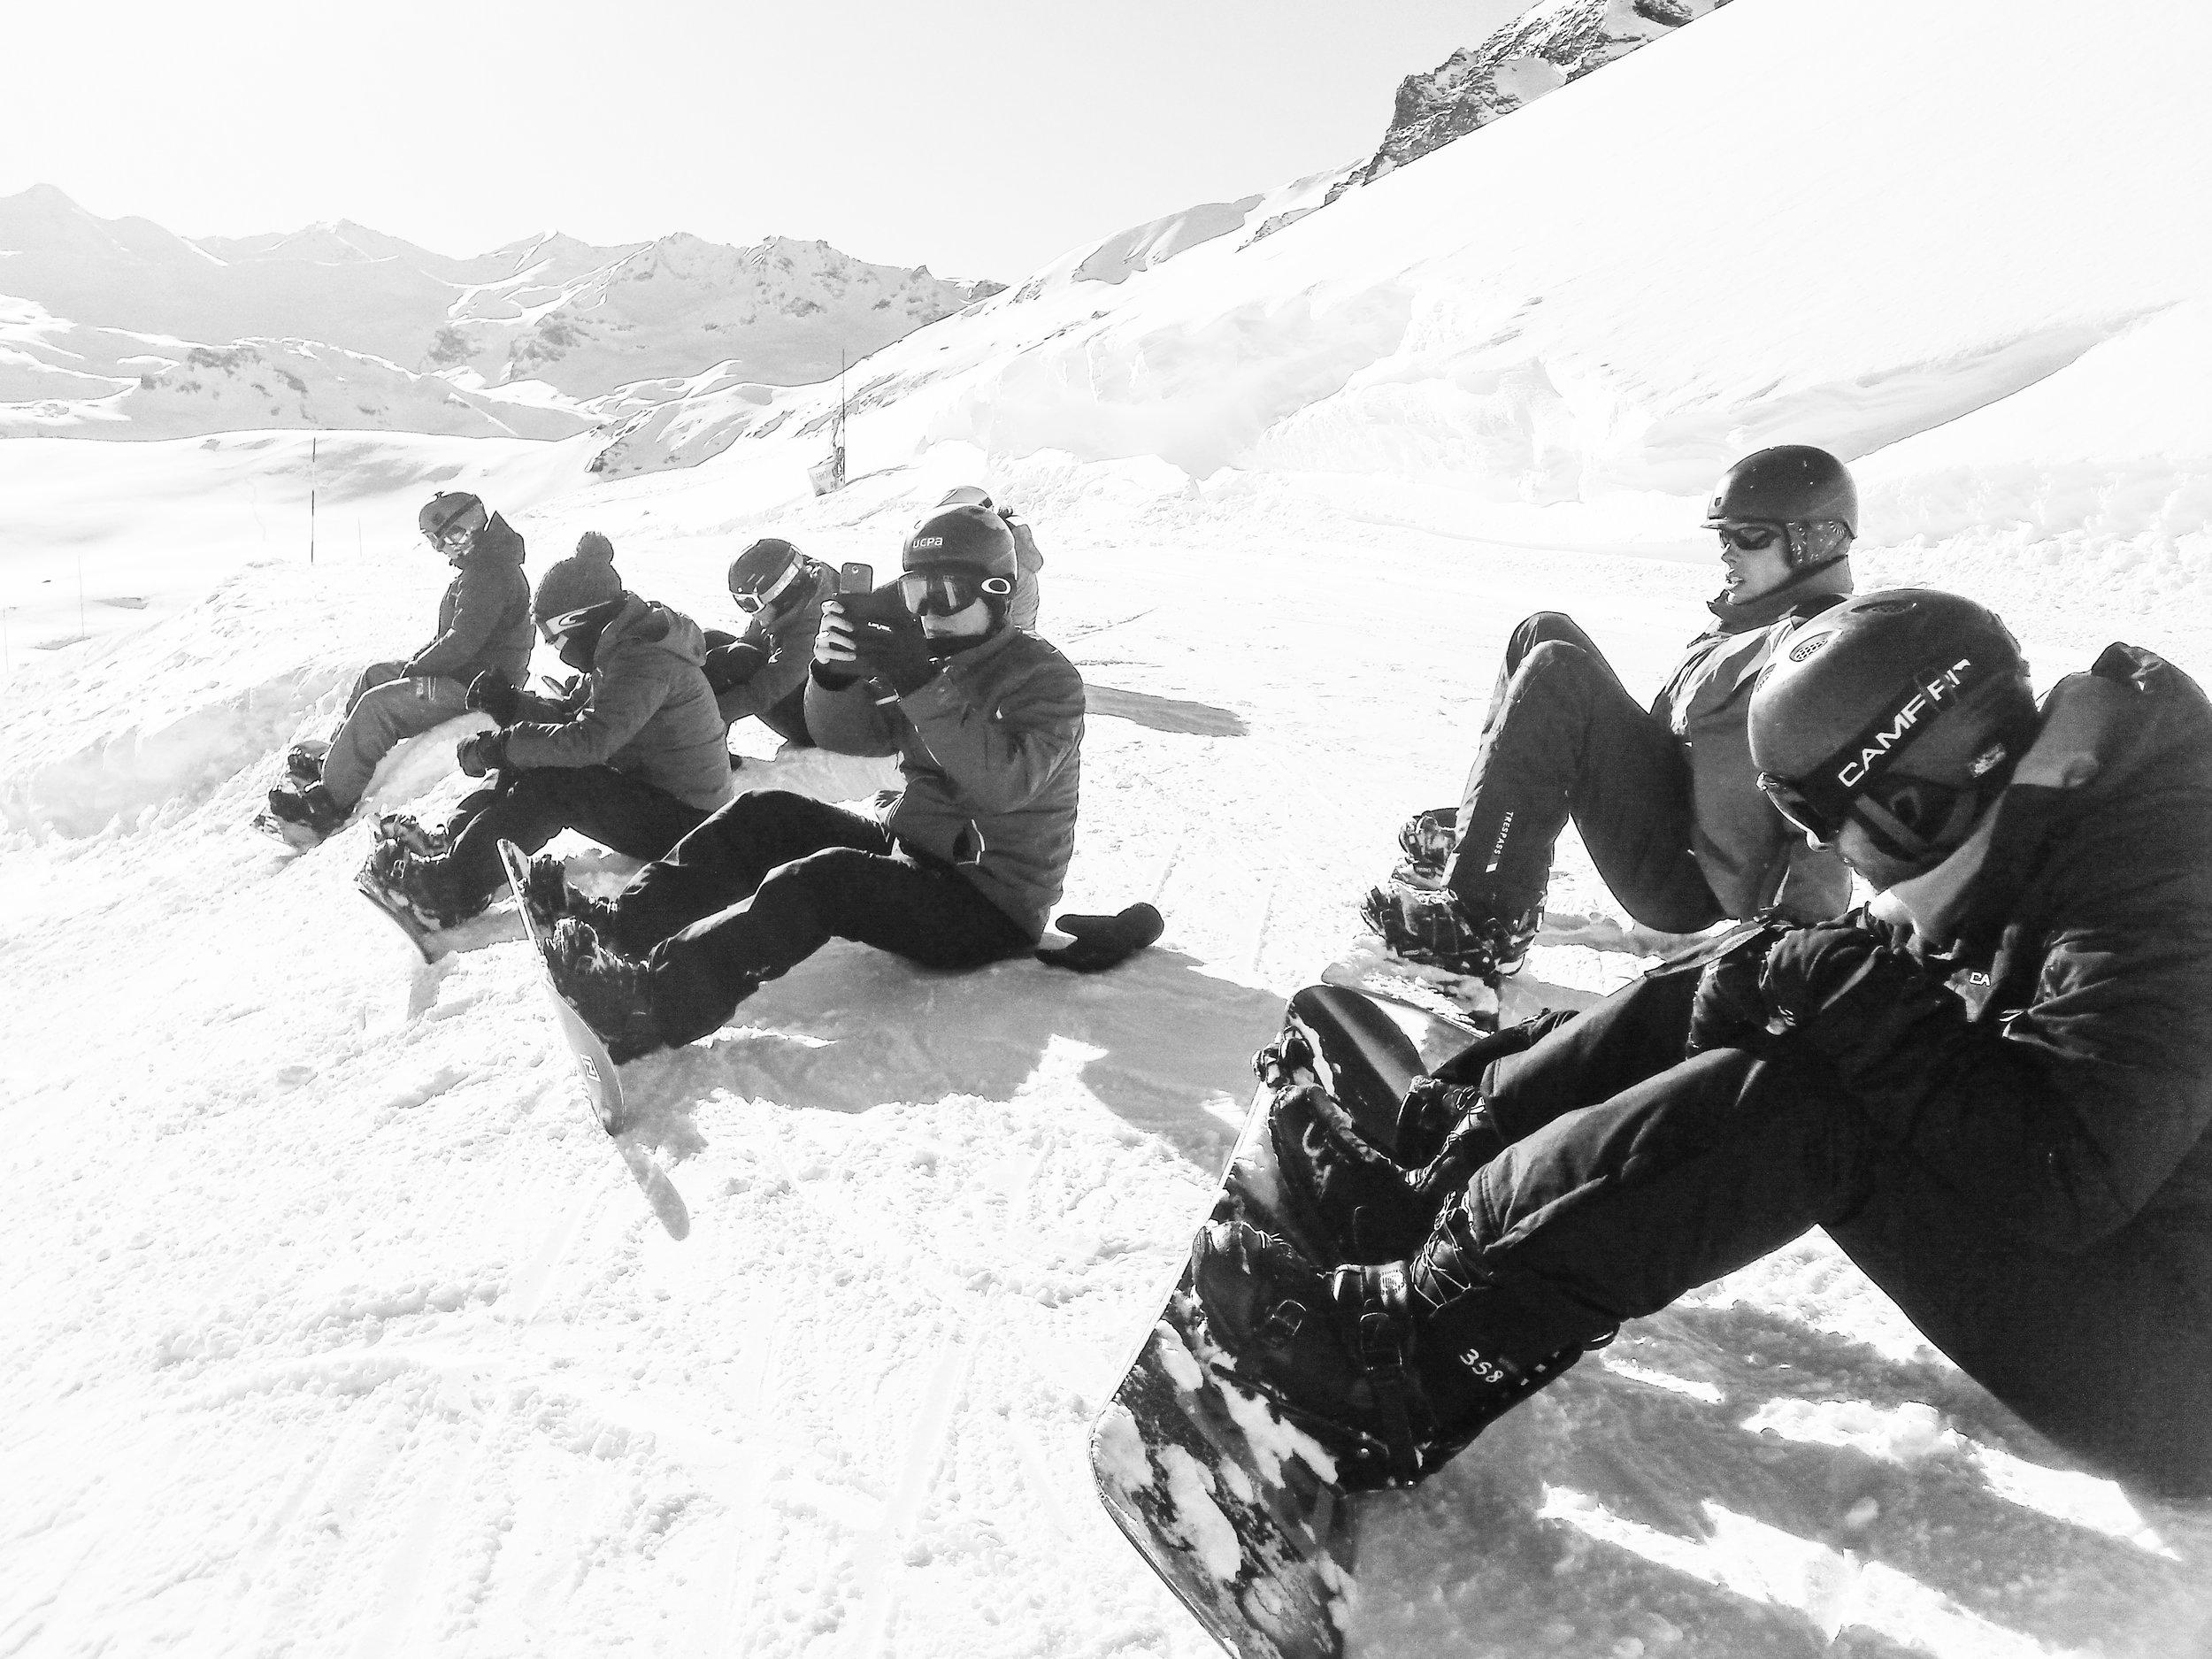 103527-val-d'Isère-snowboarding-ucpa.jpg